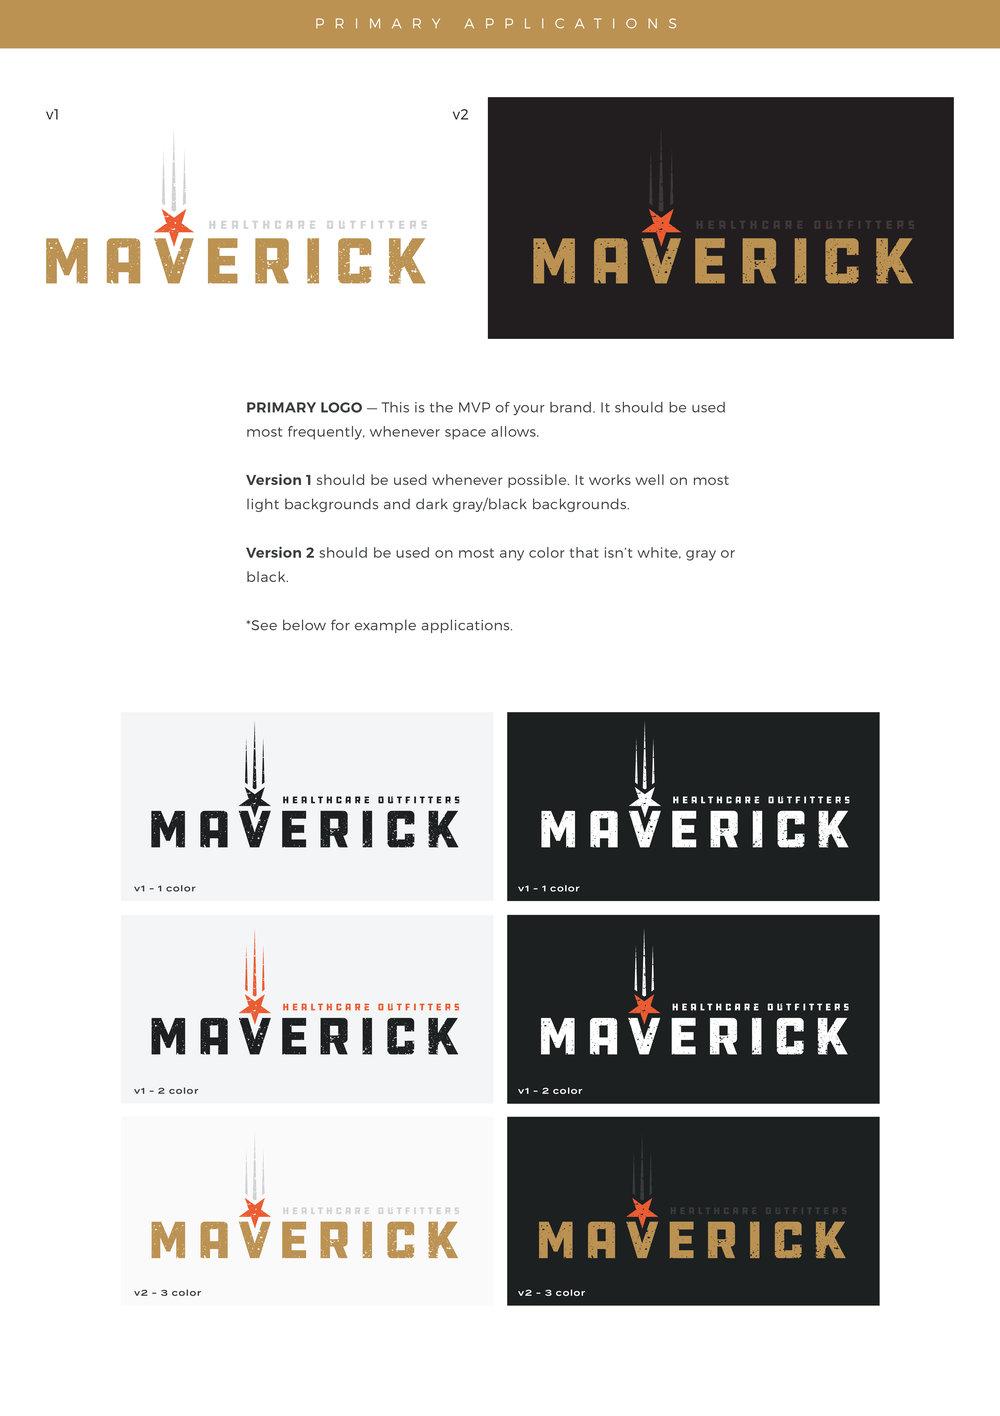 Maverick_Style_Guide_4_12_18-1_02.jpg